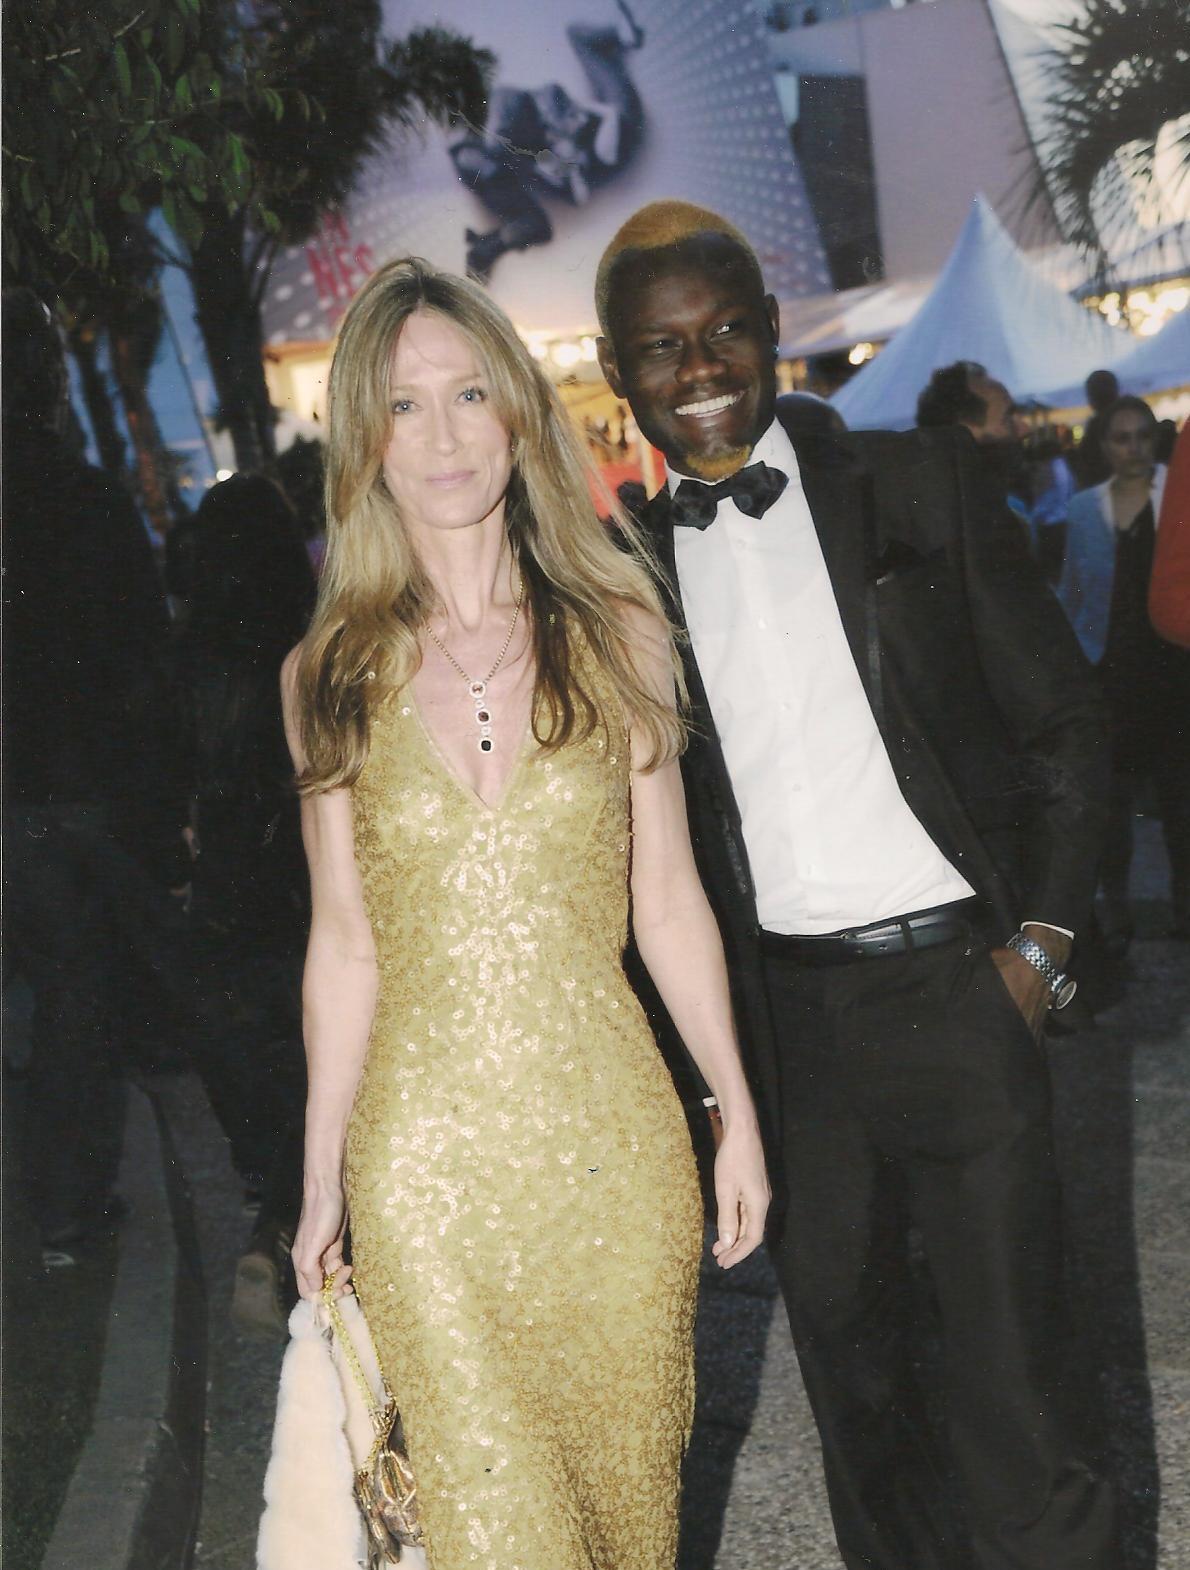 Cannes Film Festival 2013 - Angela Dixon - Actor